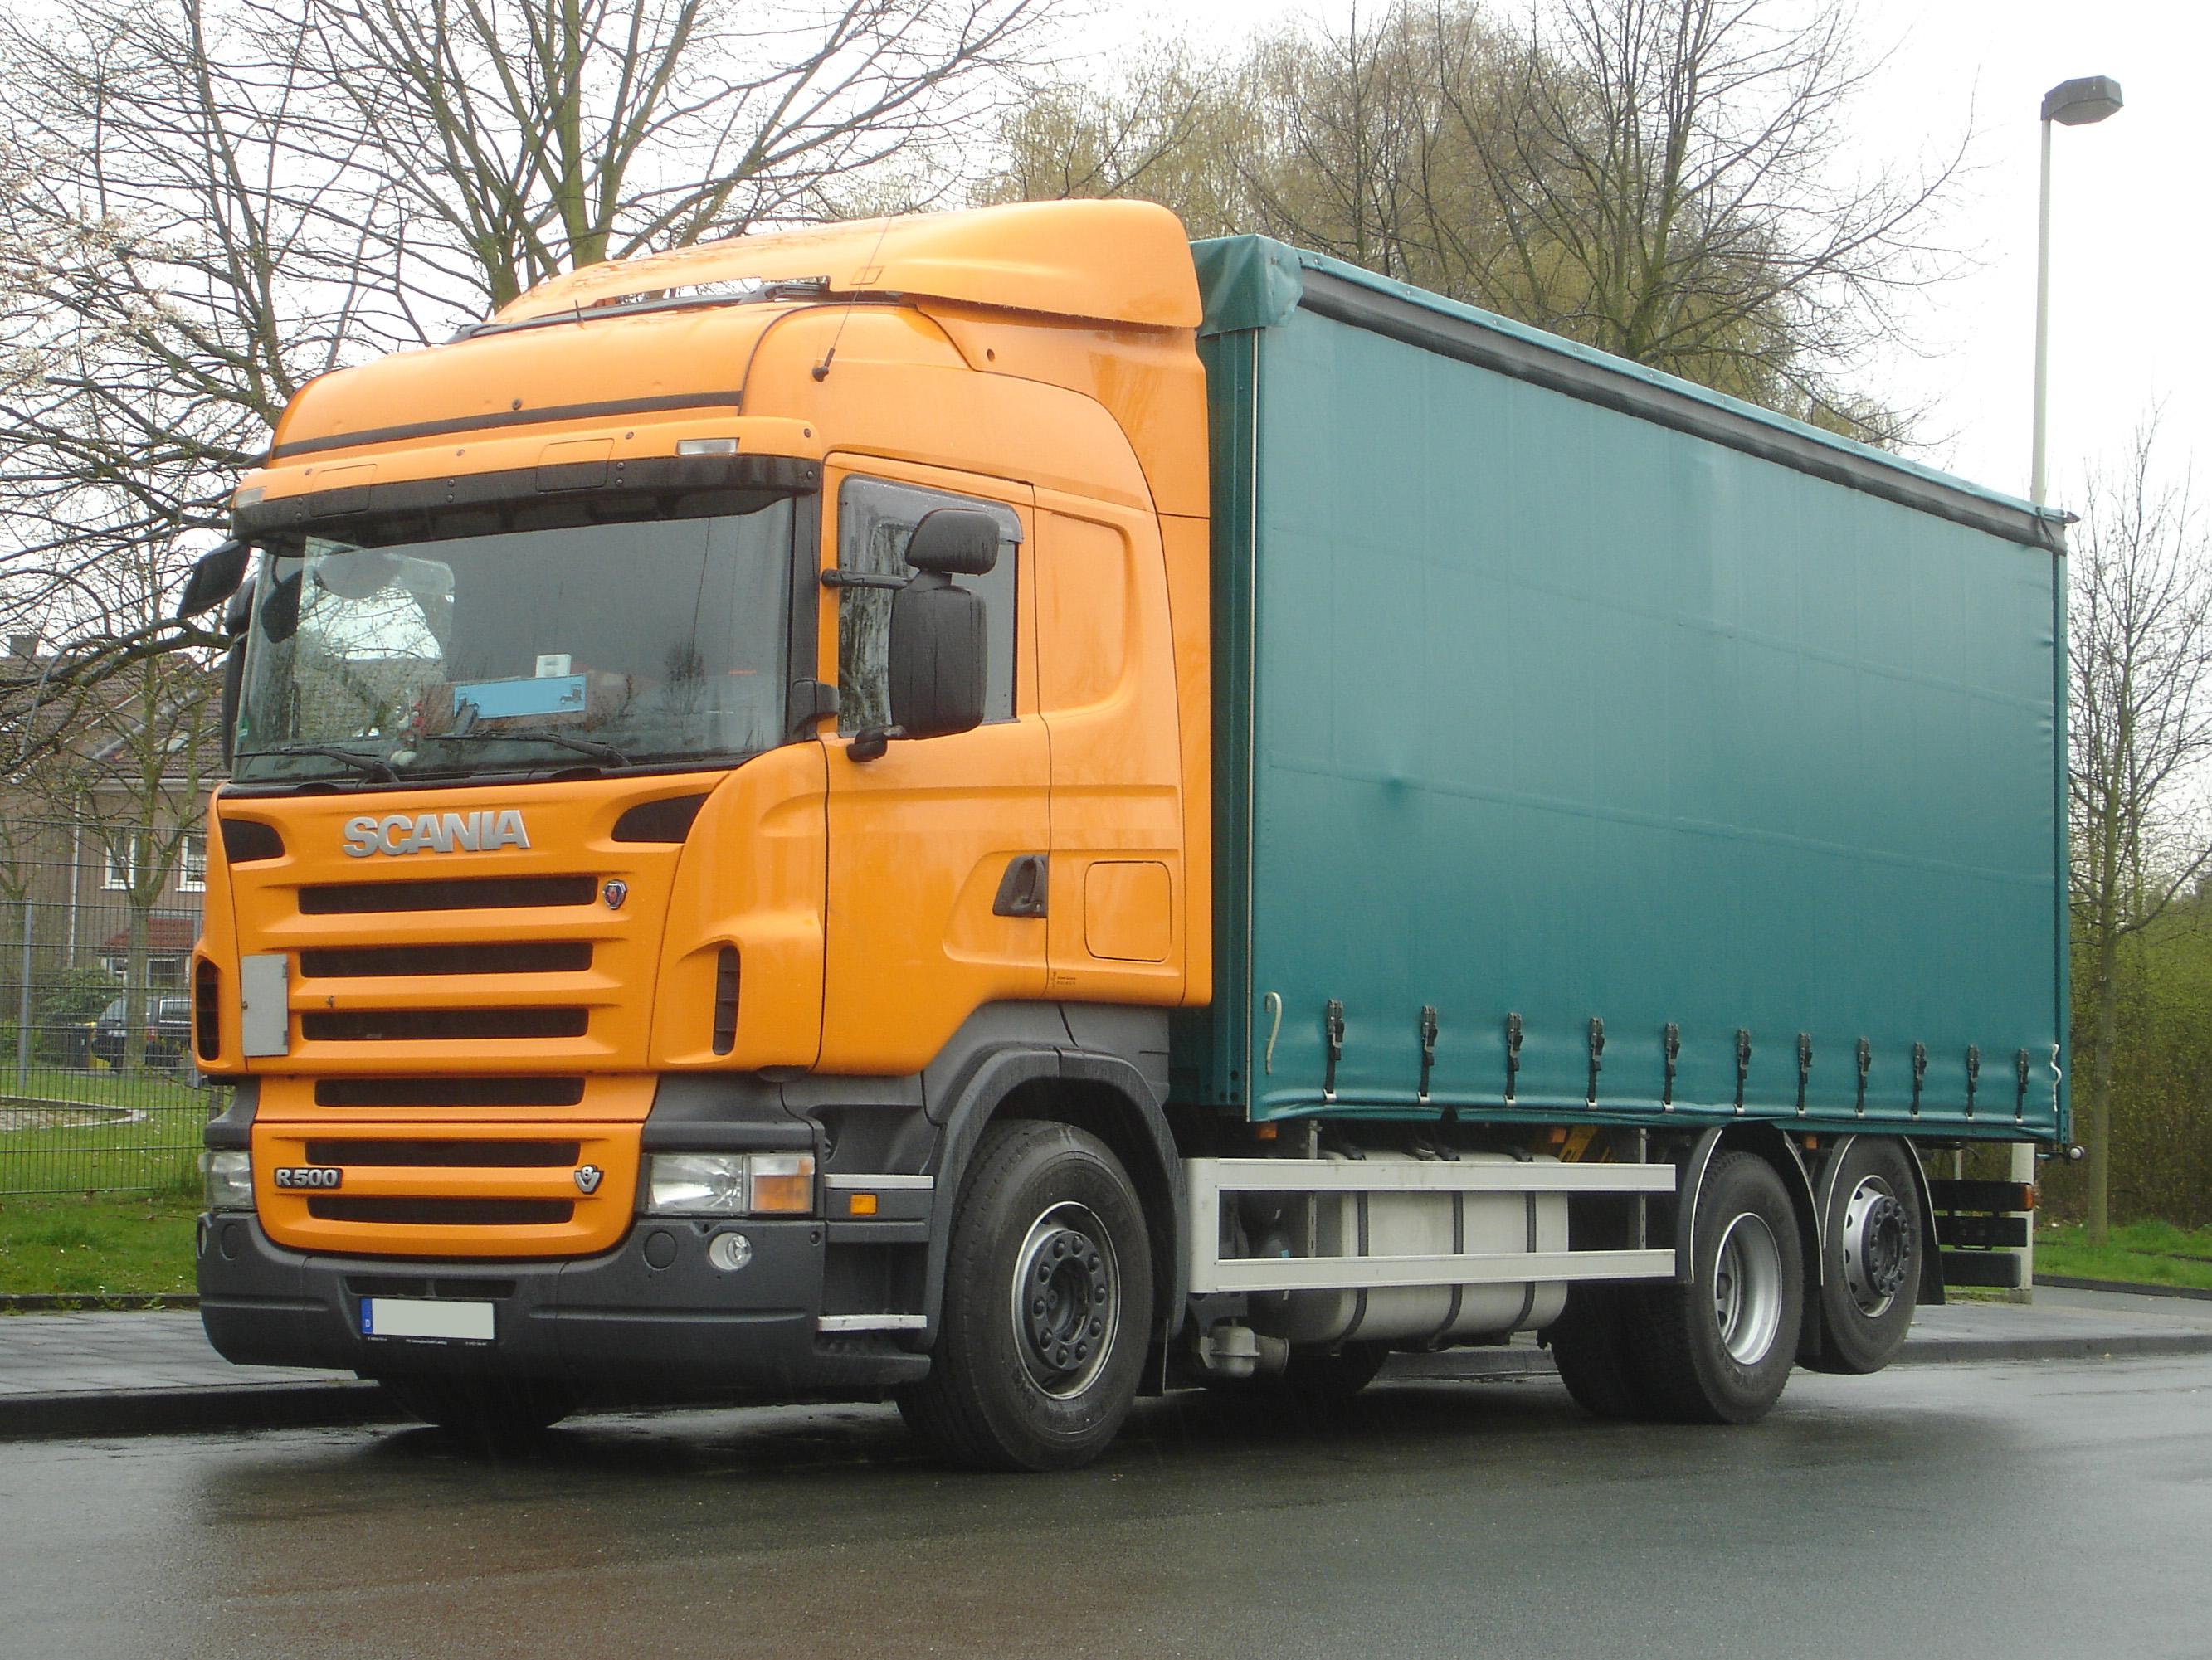 File:Scania-R500-Gardinenplanen-Lkw.jpg